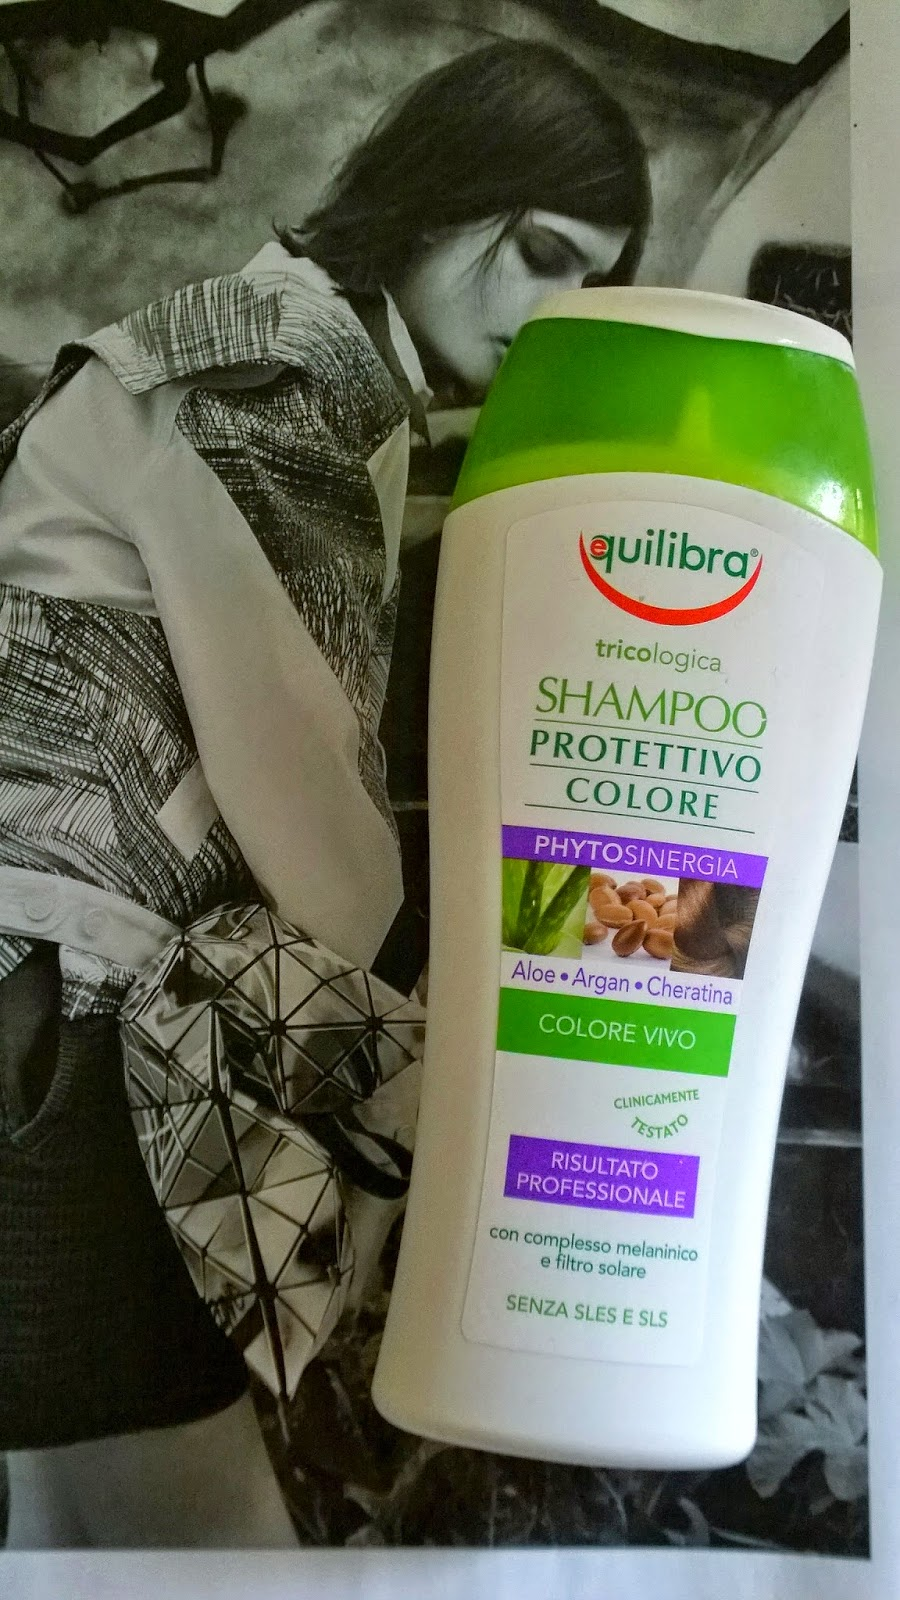 Shampoo Equilibra Prottetivo Colore